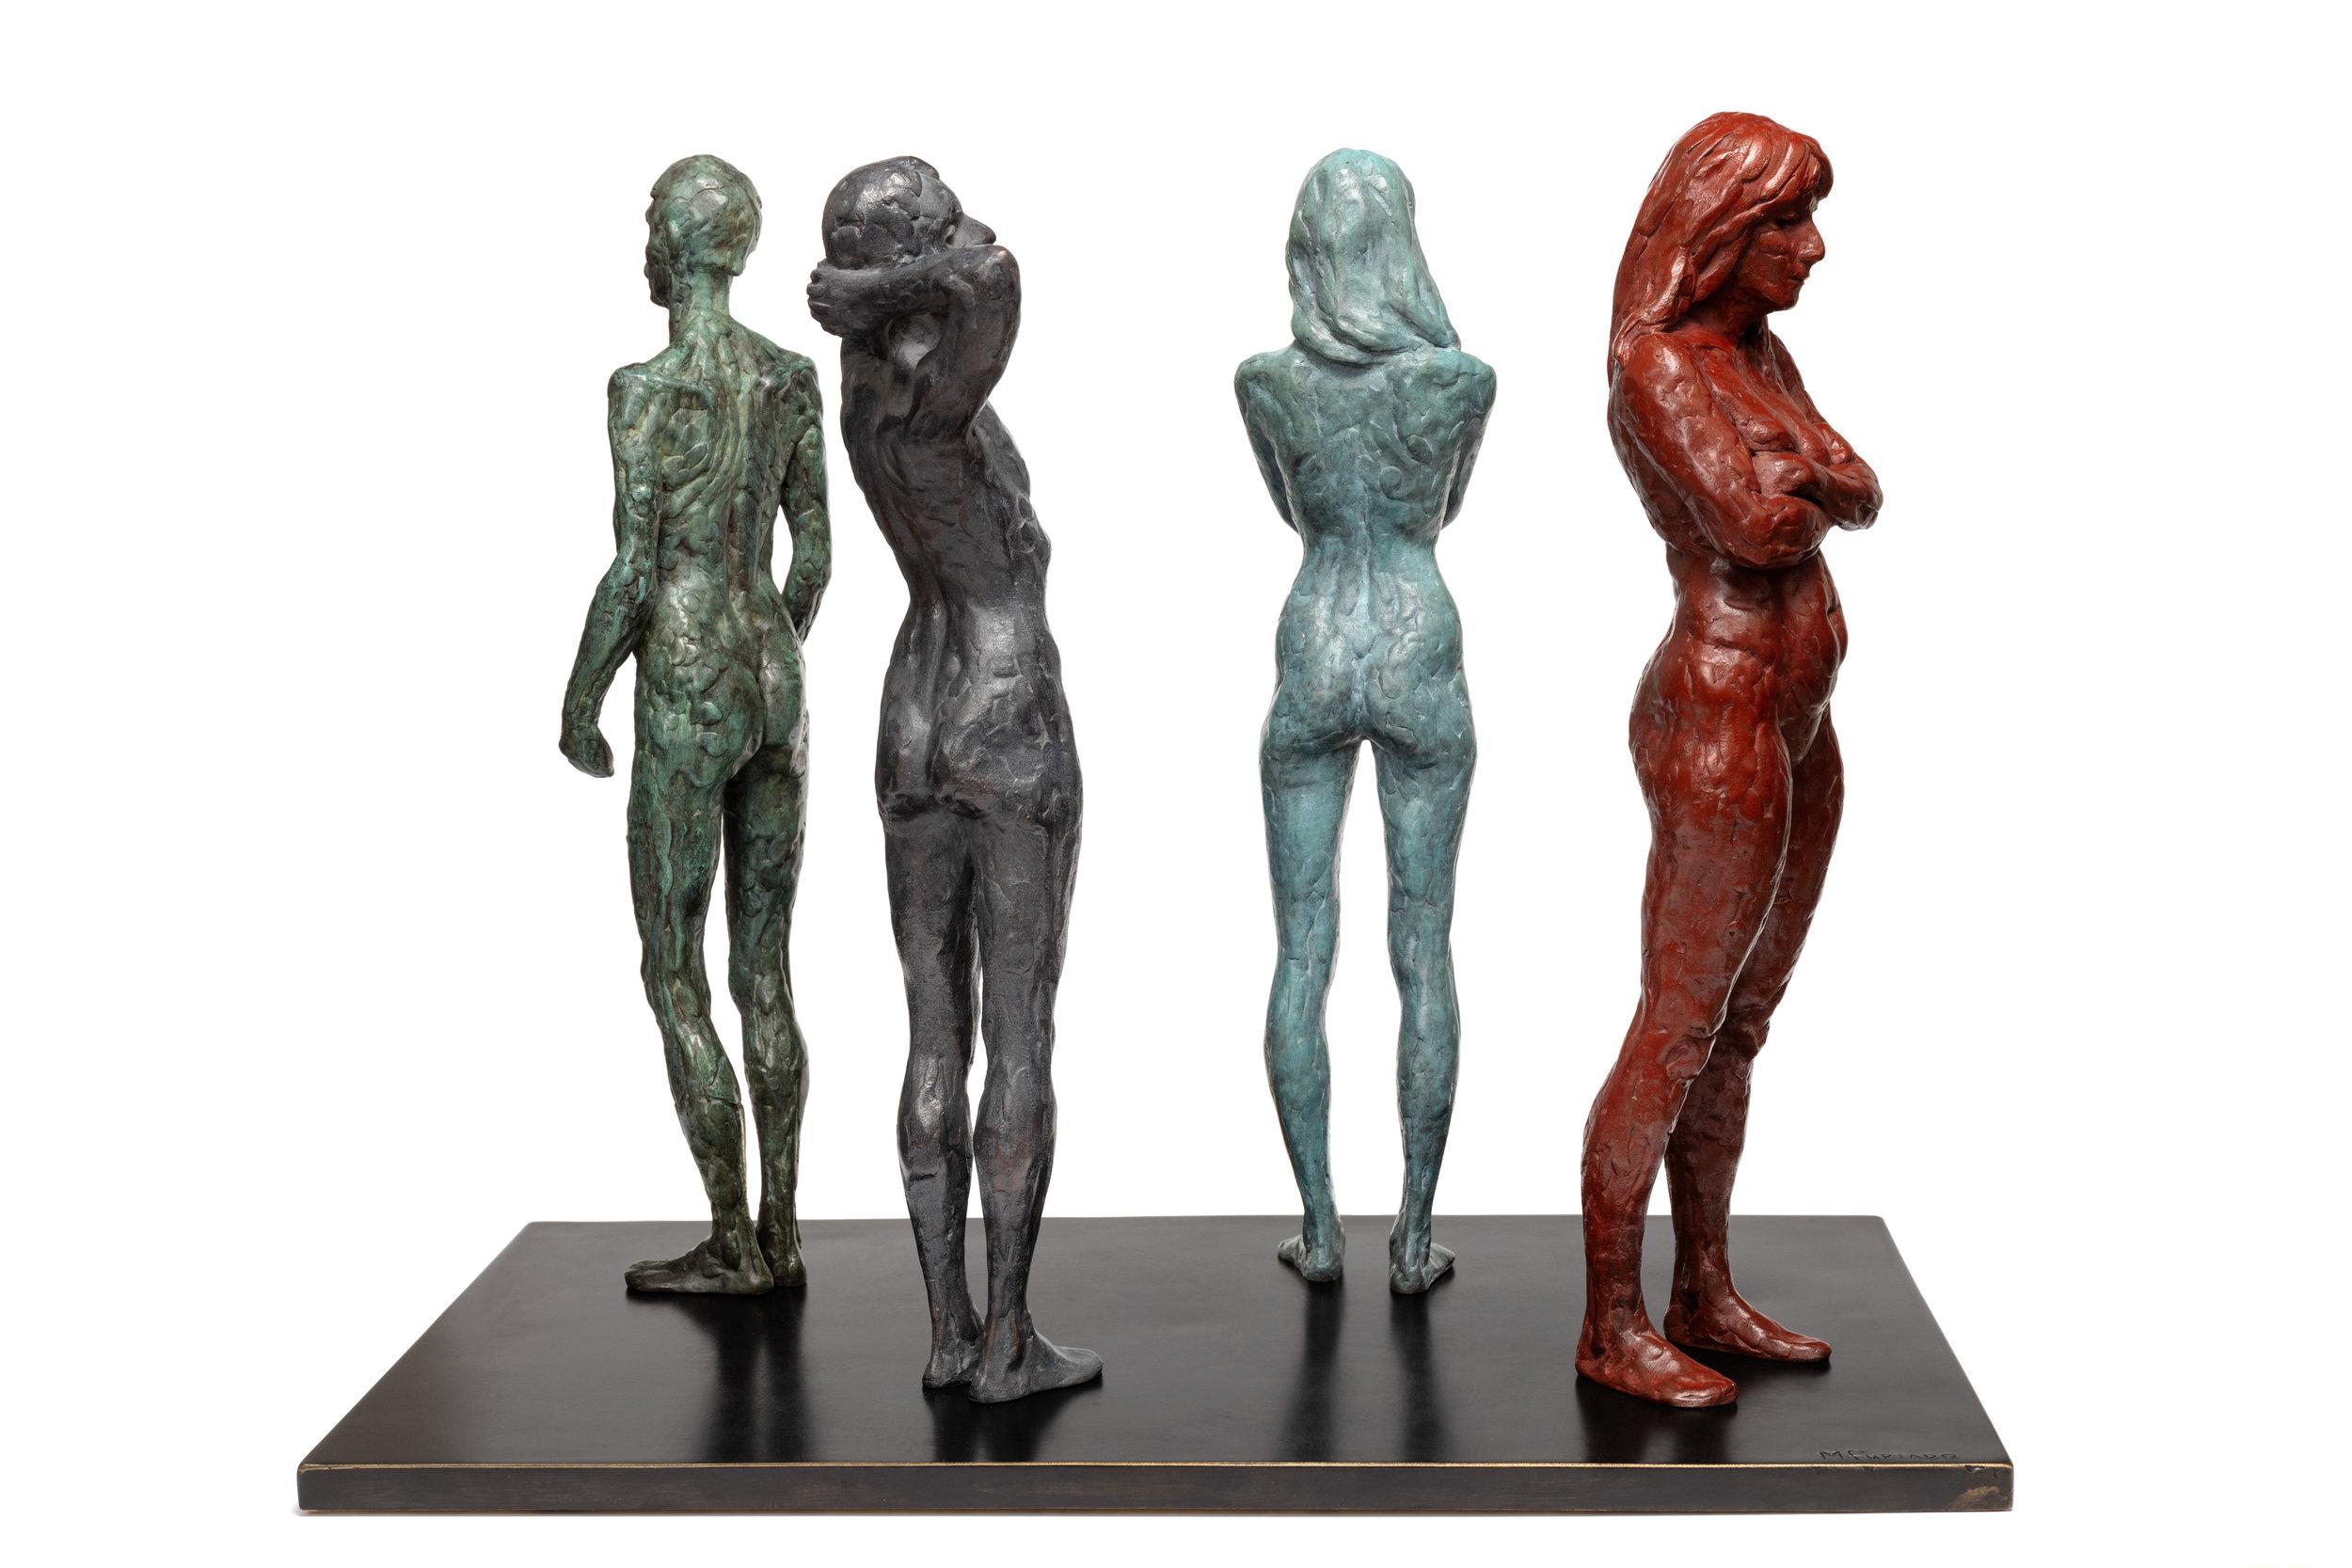 mf-figure-group-bronze-002.jpg